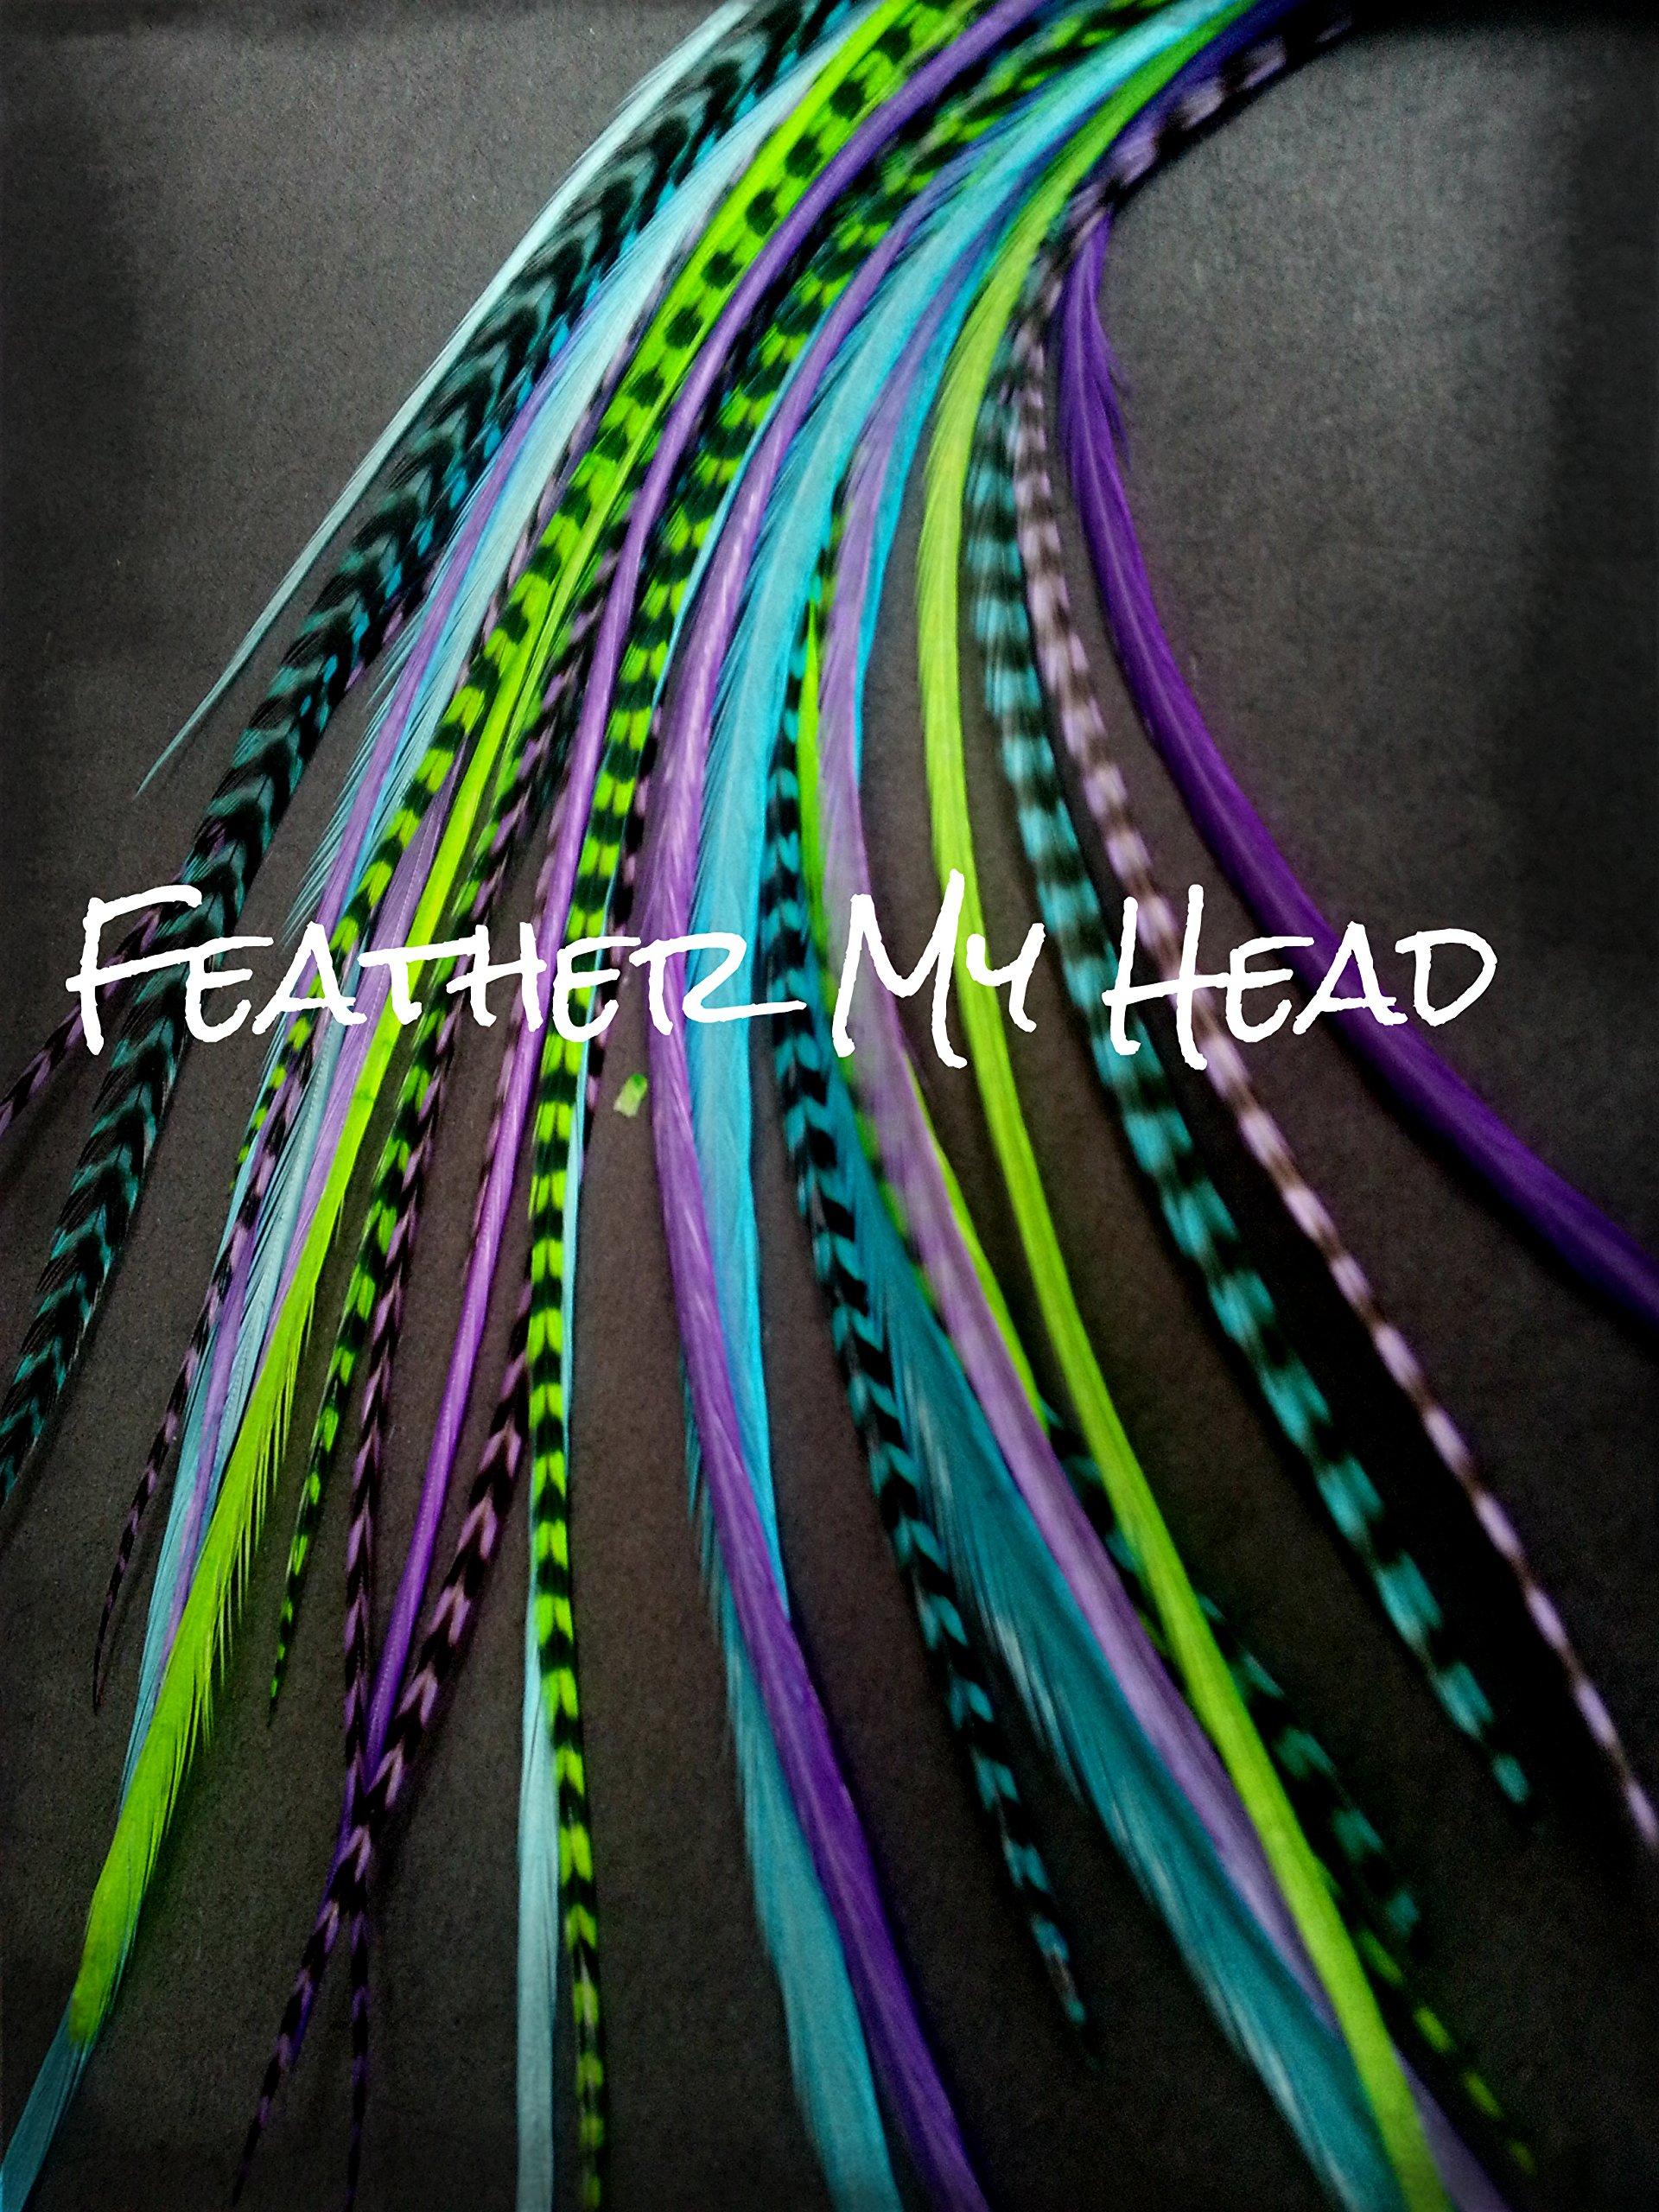 Feather Hair Extensions - 16 Piece - Purple Green Blue - Caribbean 11'' - 14'' Long (28-36 cm)